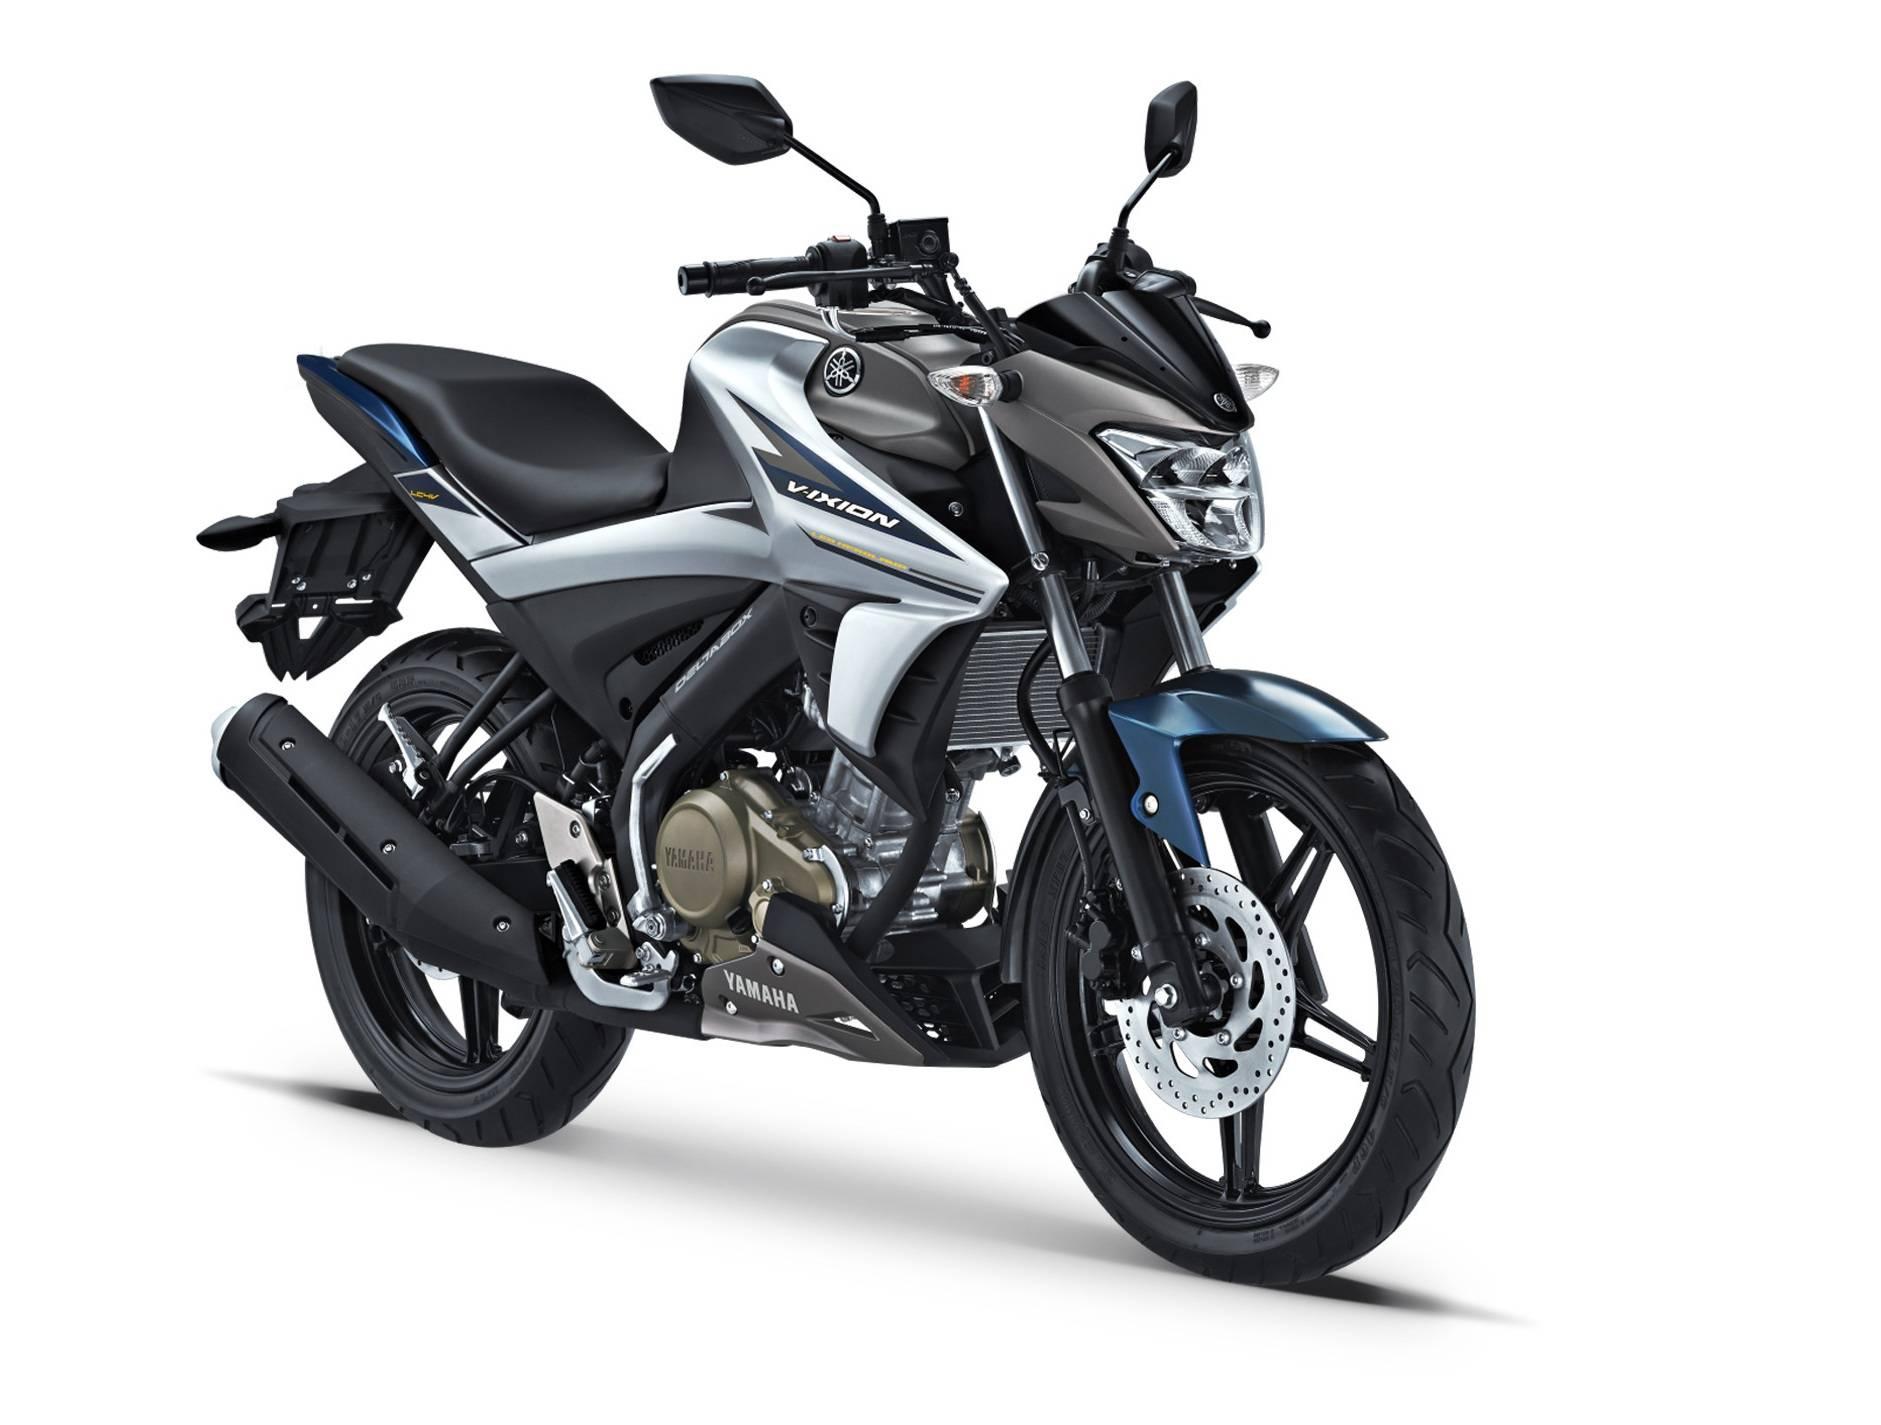 All New Yamaha Vixion 150cc Dan Vixion R 155cc Terbaru 2017 Resmi